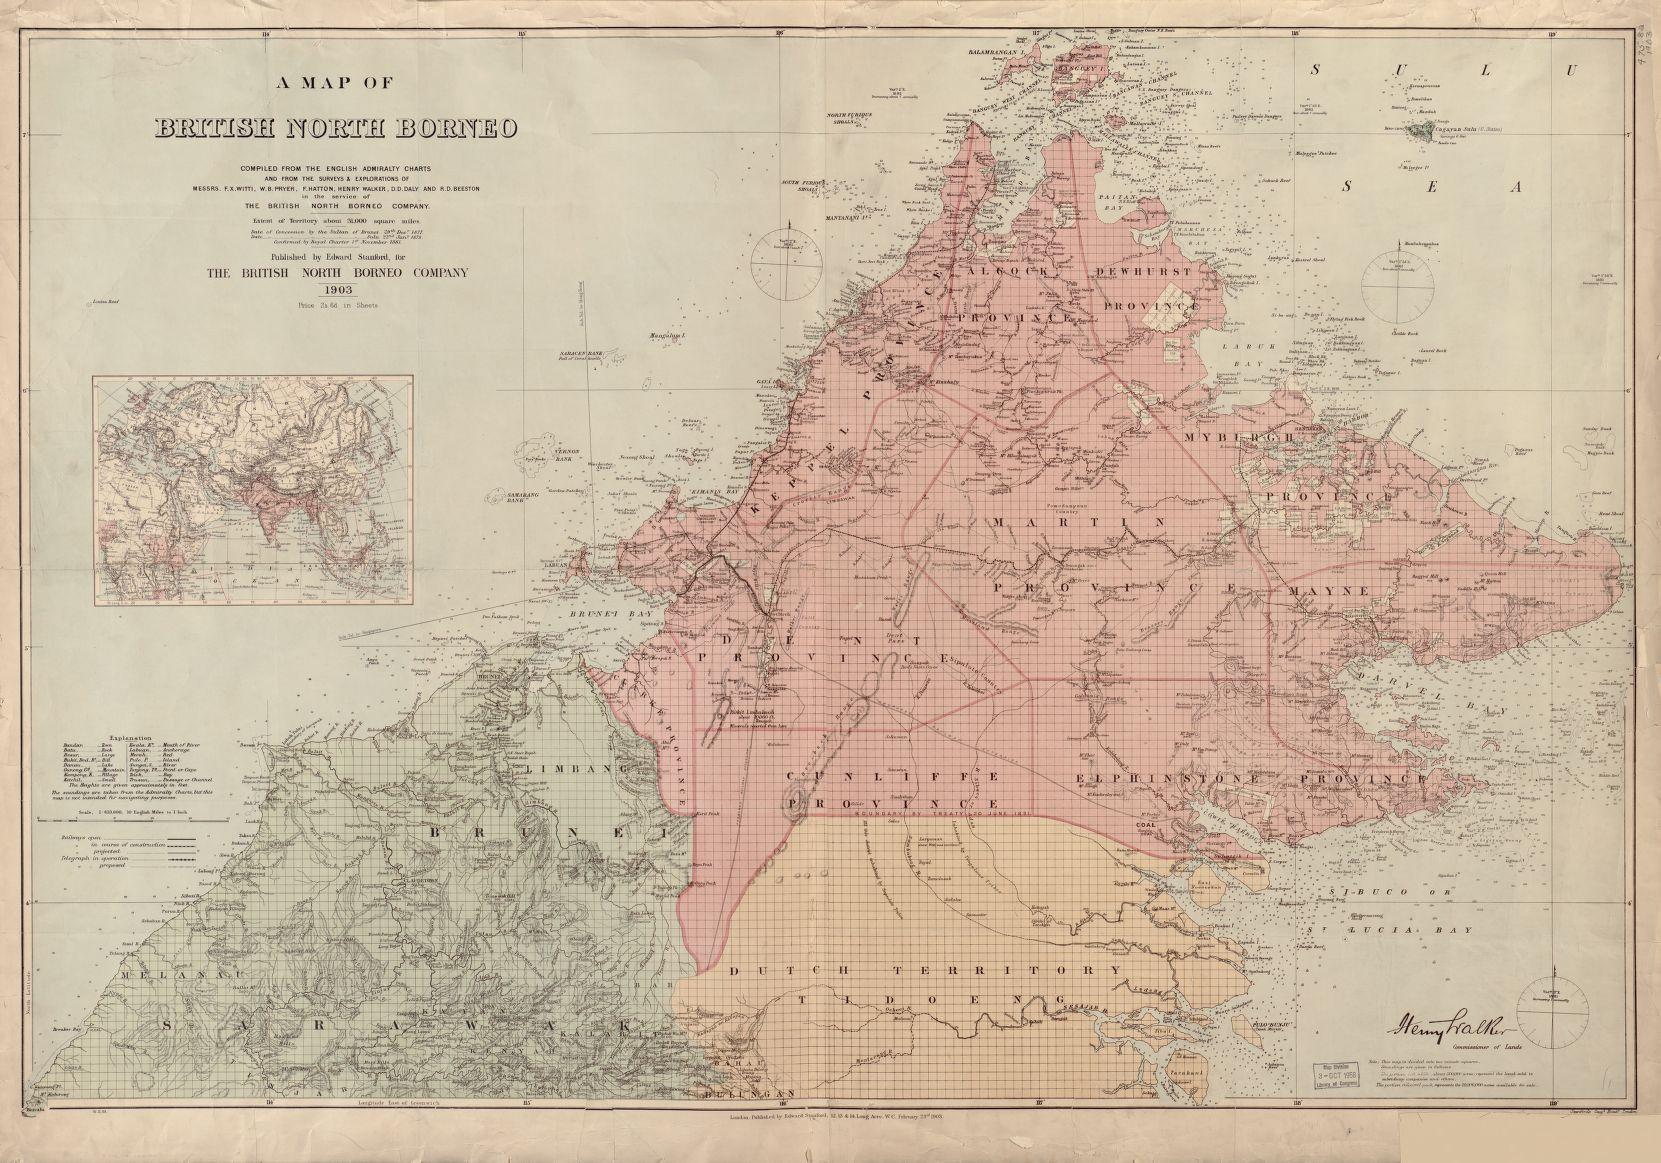 Map of North Borneo, 1903